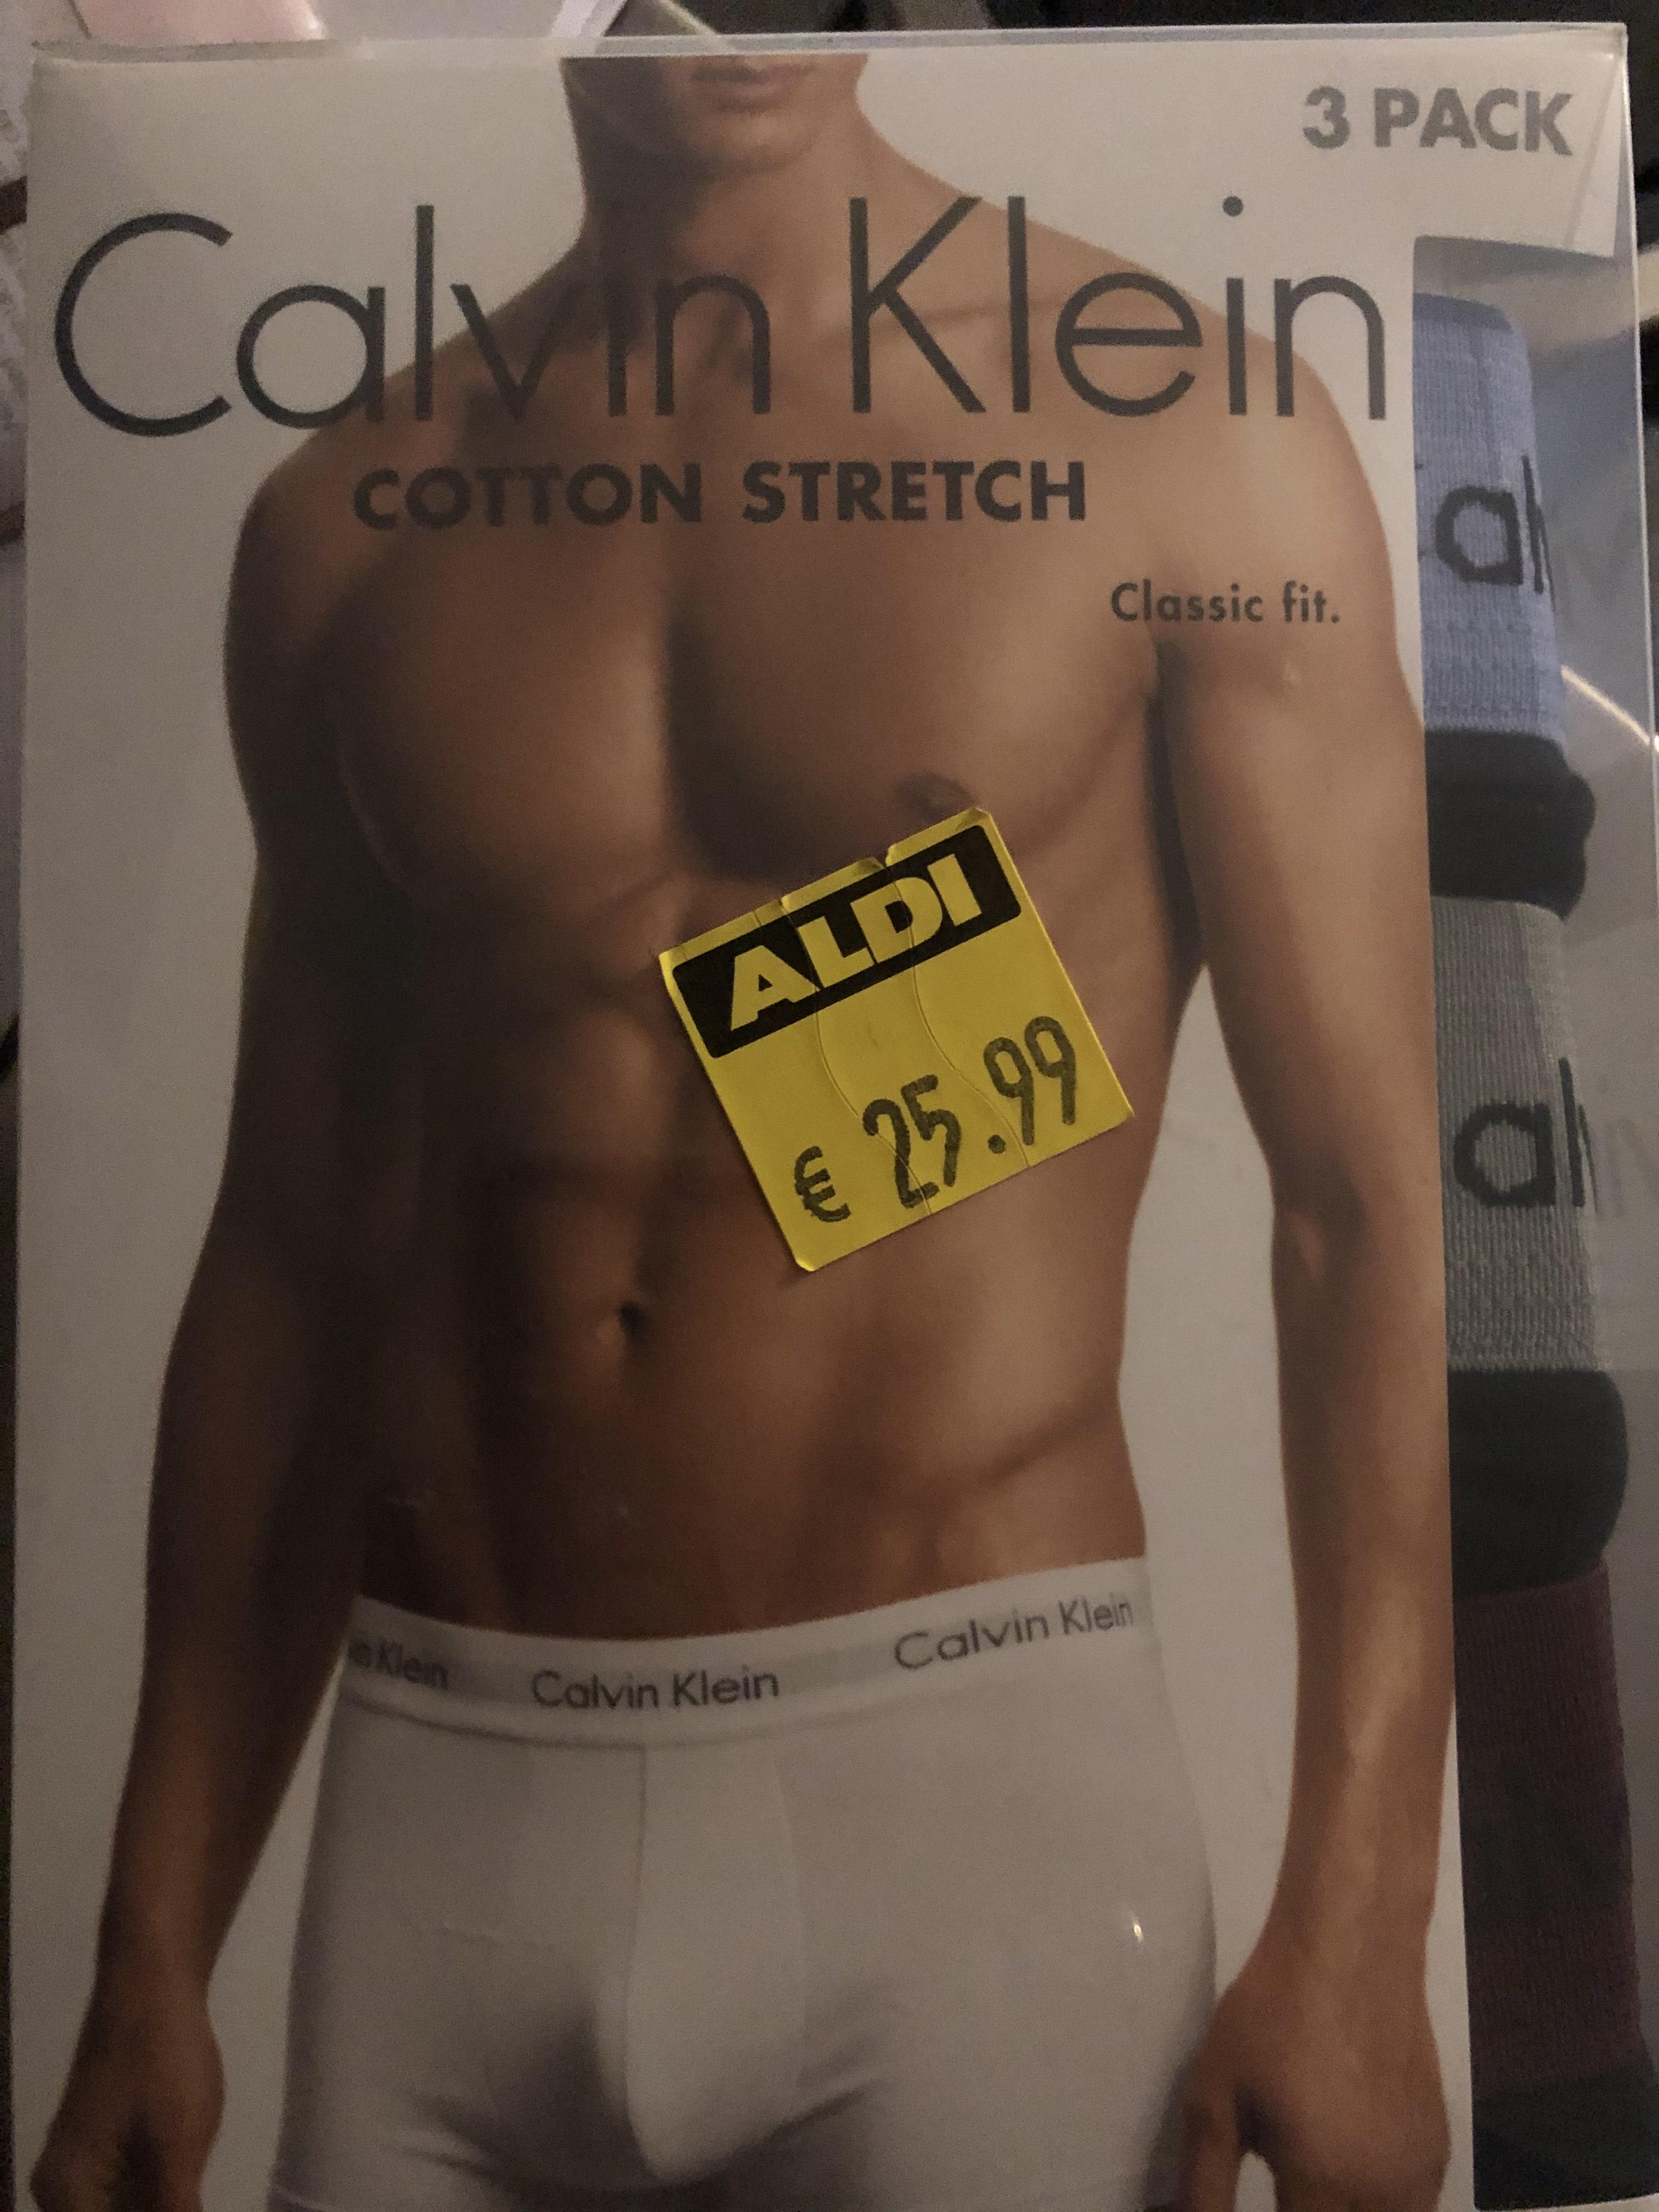 [Lokaal?] Calvin Klein 3-Pack boxershorts! + EXTRA KORTING!